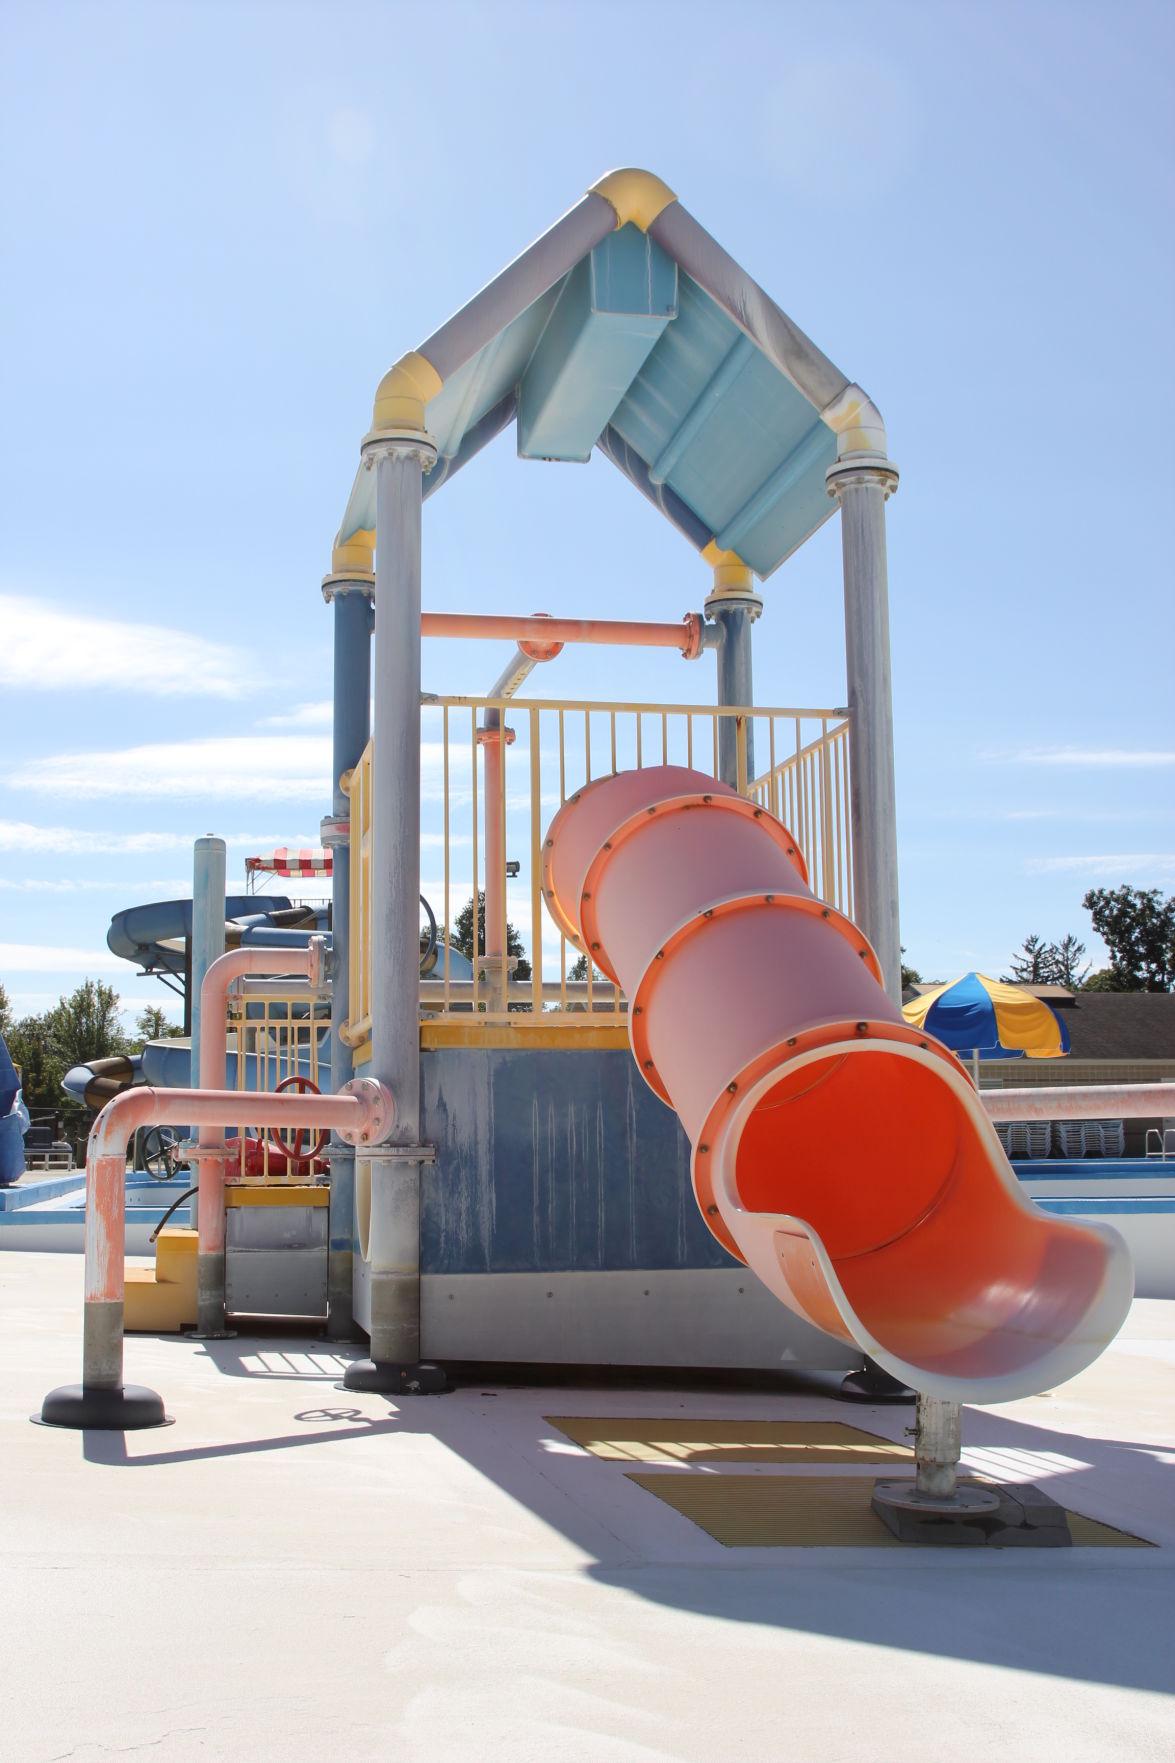 Meyer Municipal Aquatic Center